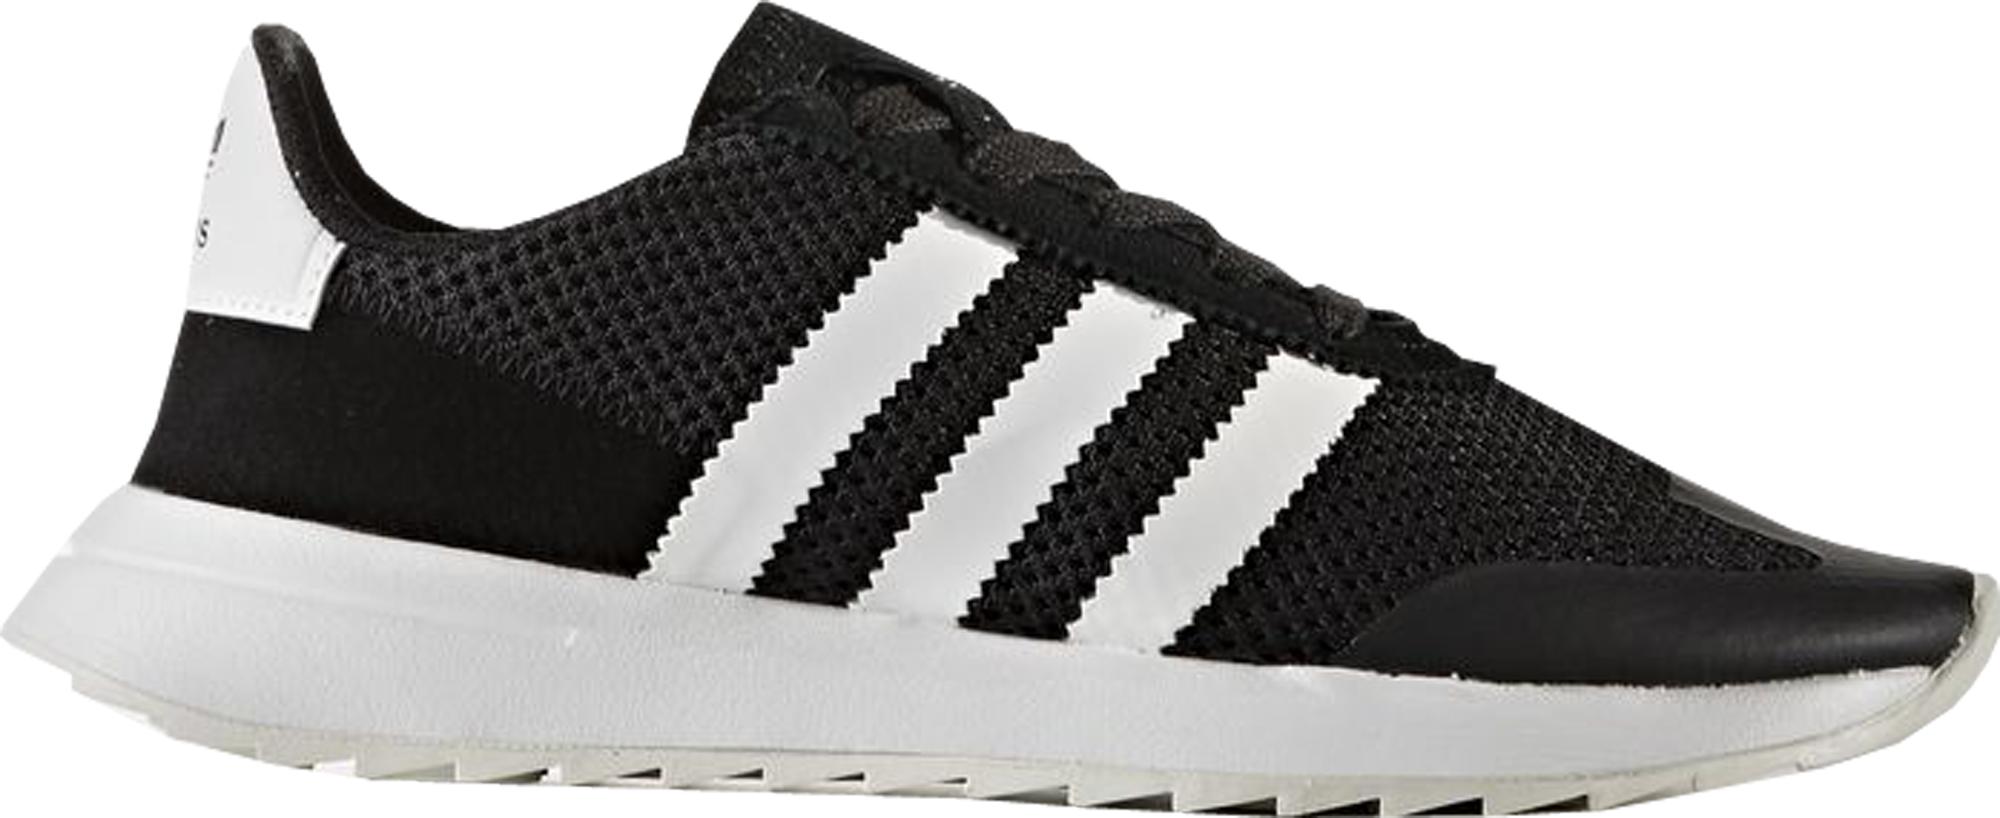 adidas Flashback Black White (W) - BB5323